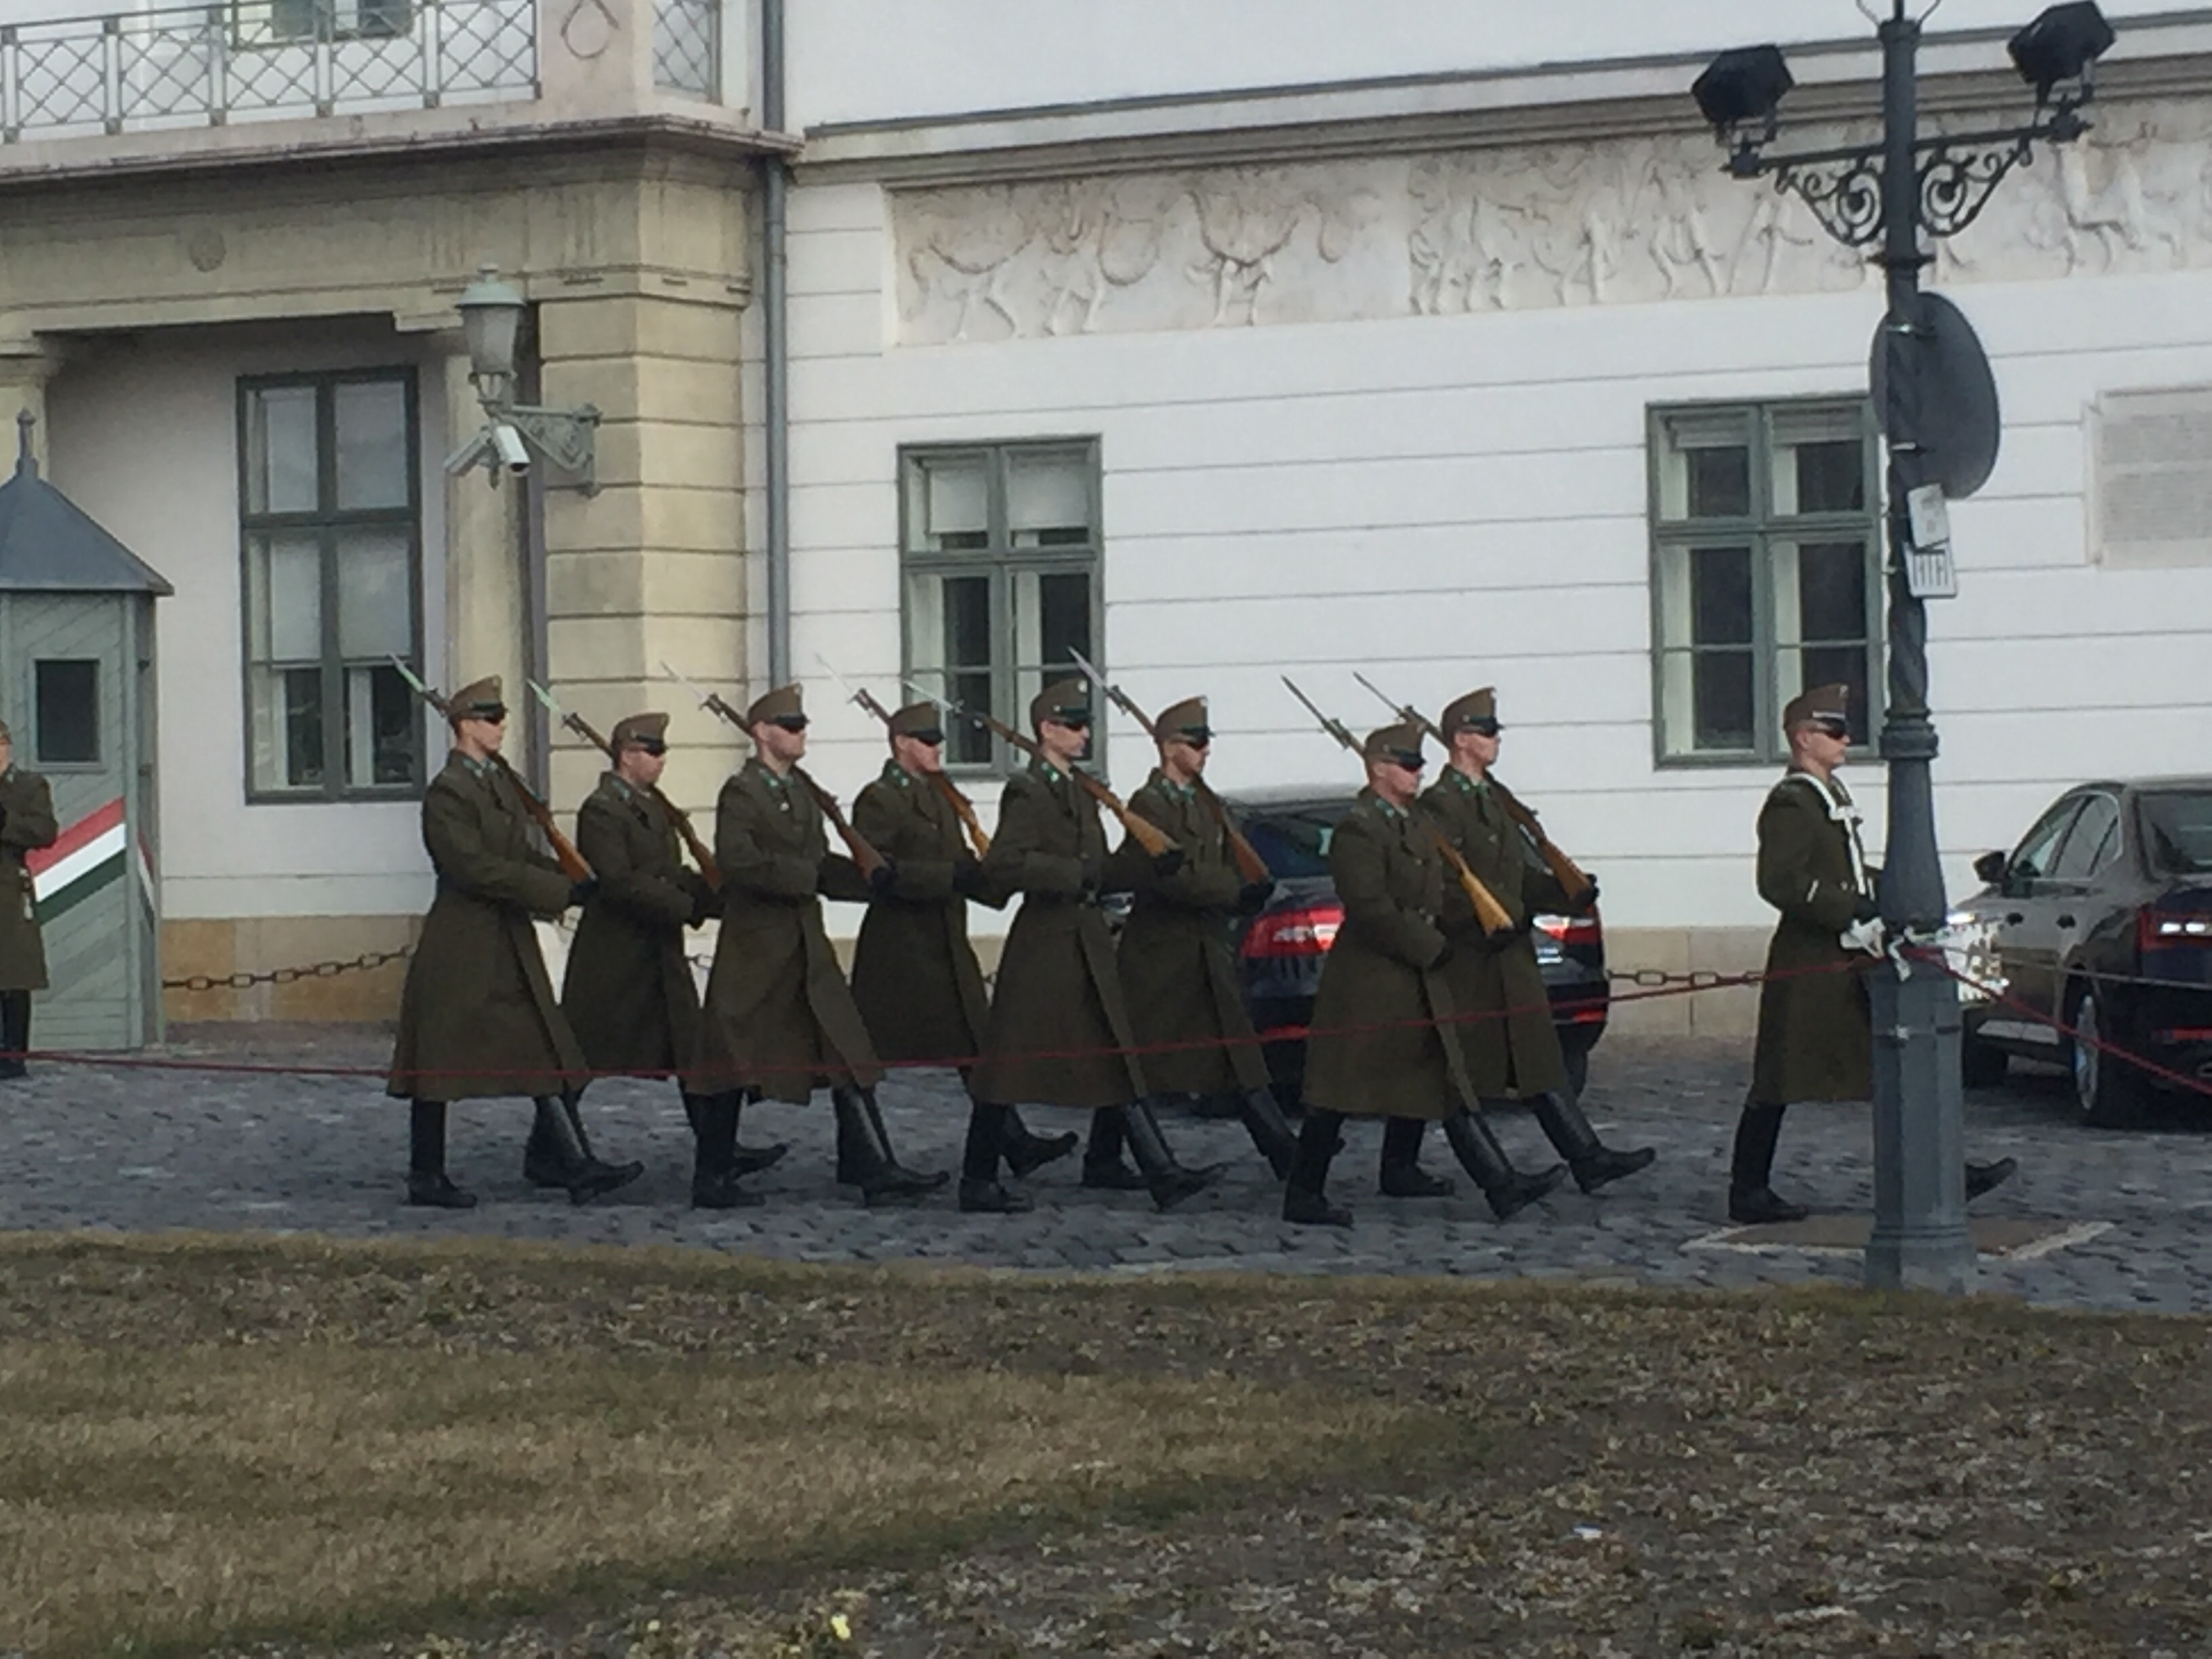 Soldiers display at Buda Castle.